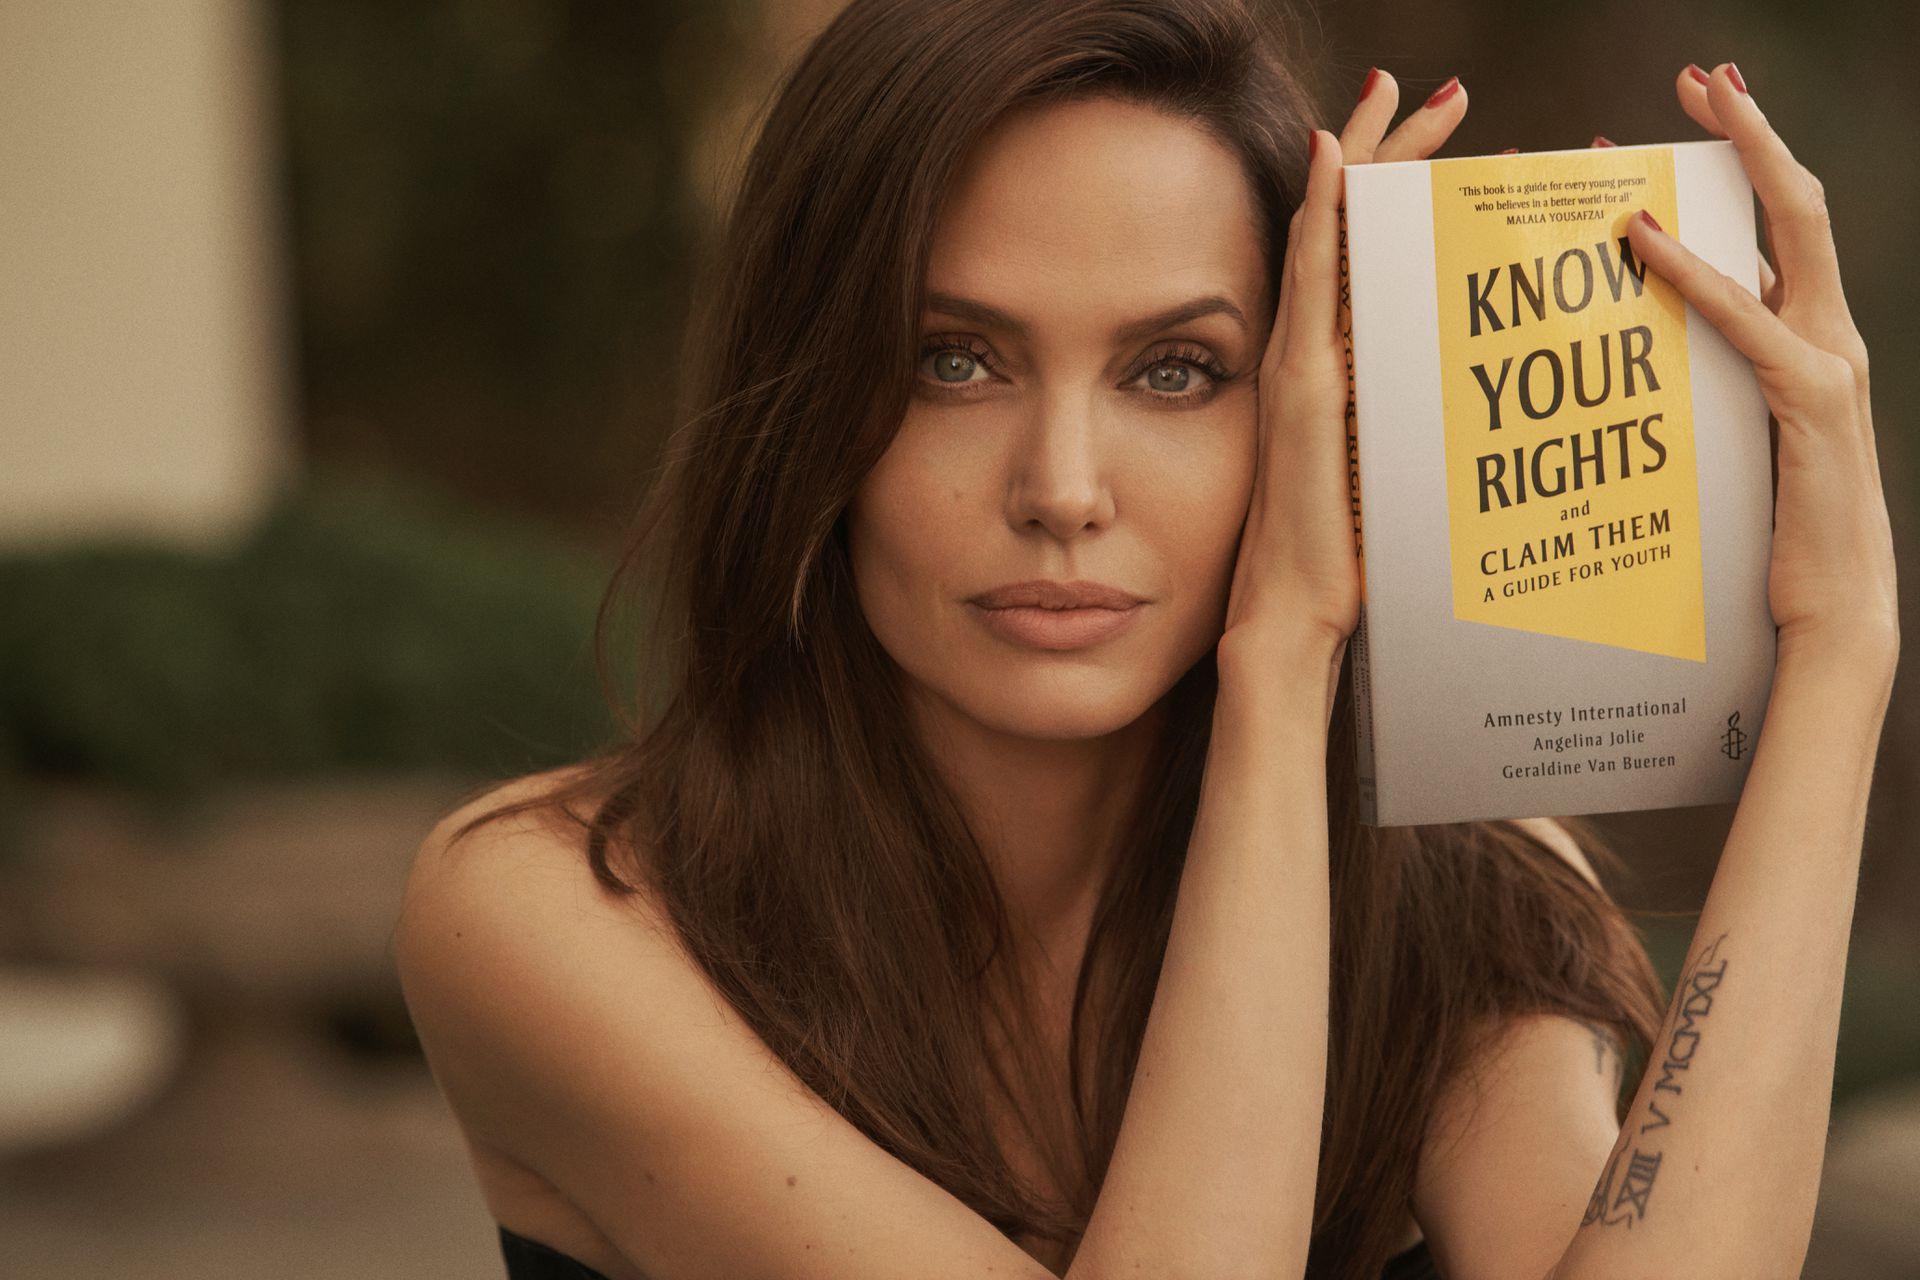 Angelina Jolie ra sách về quyền trẻ em - Ảnh 1.